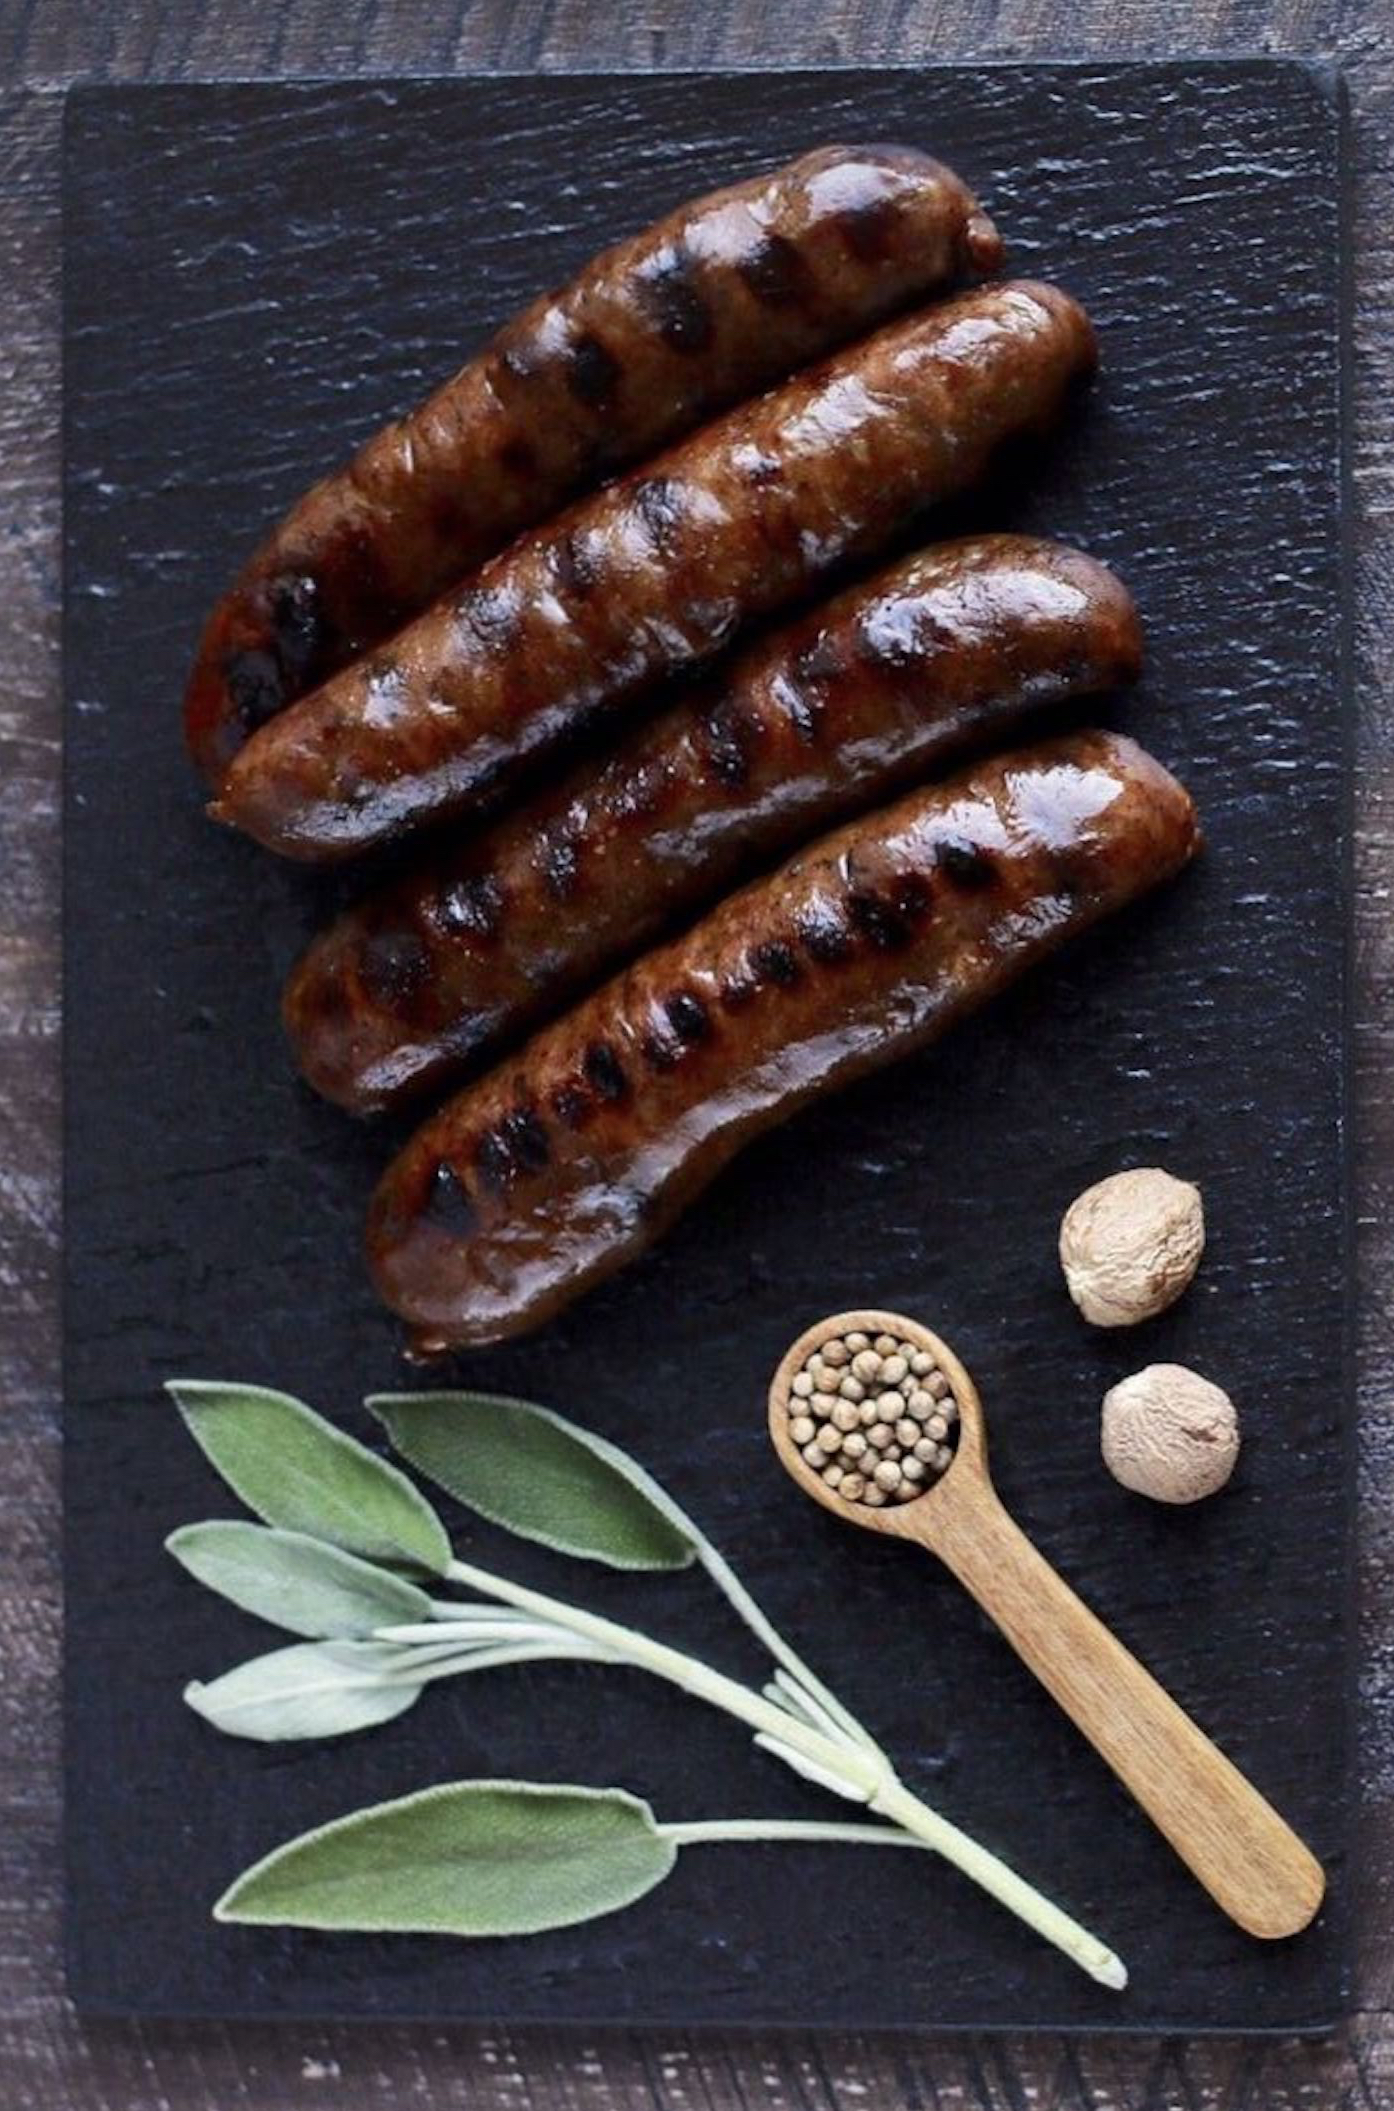 sausage crop.jpg